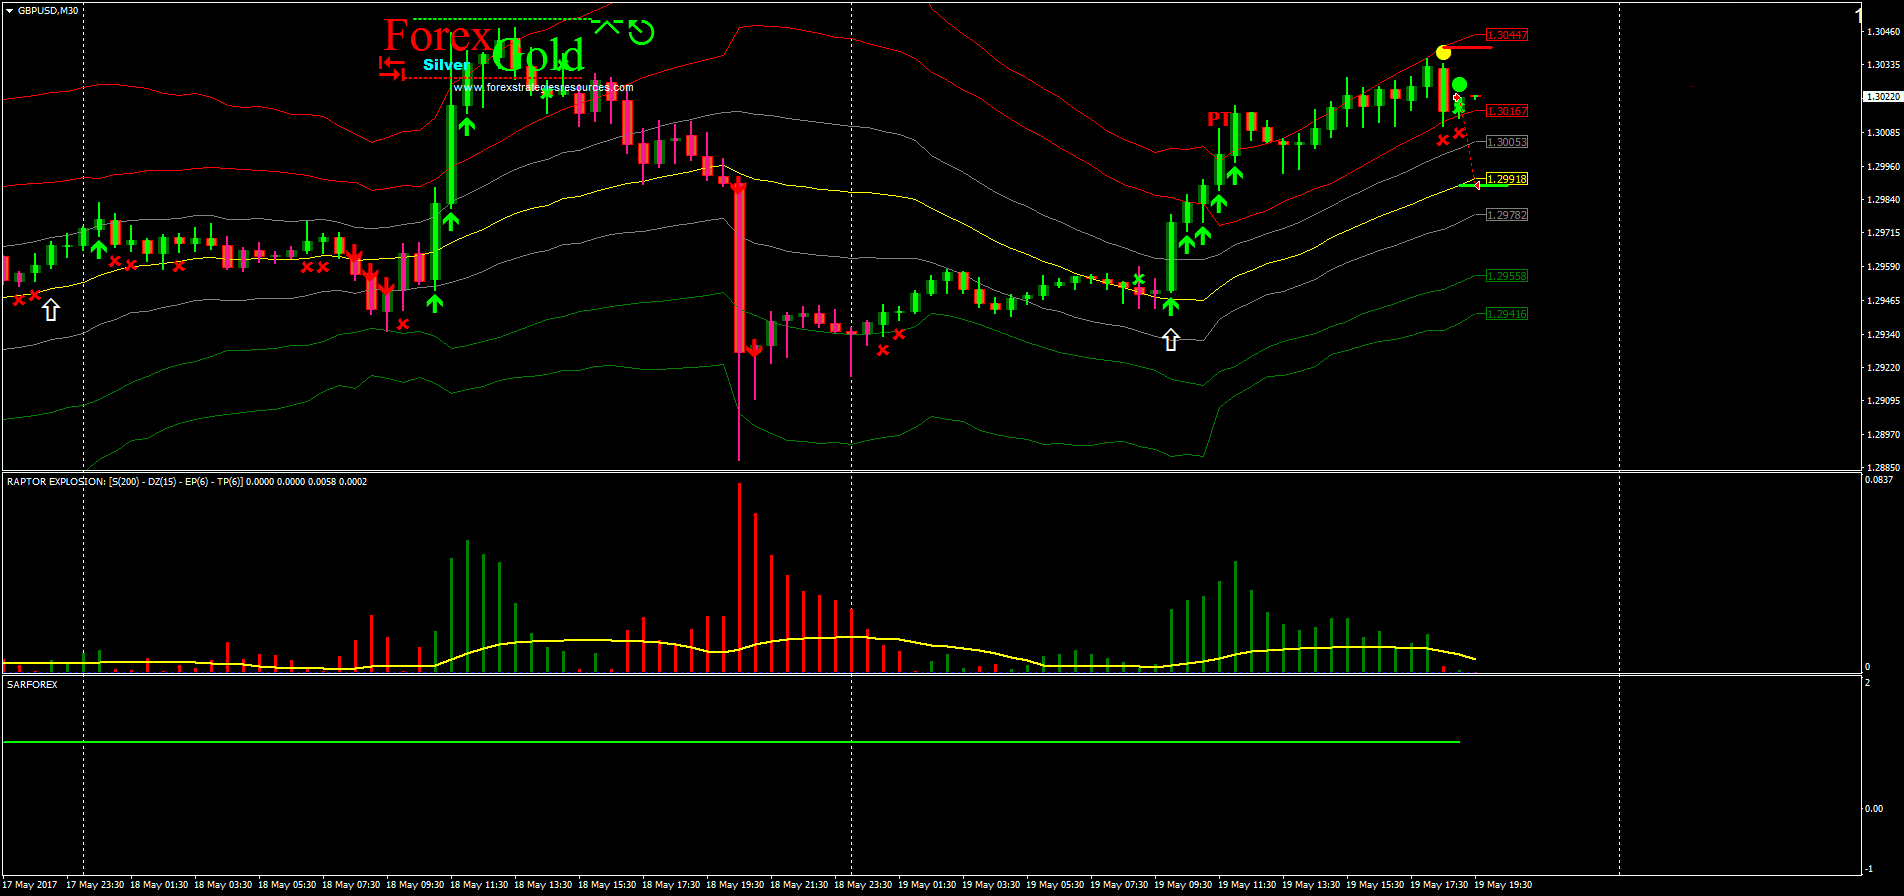 Raptor Explosion Trading System - Forex Strategies - Forex